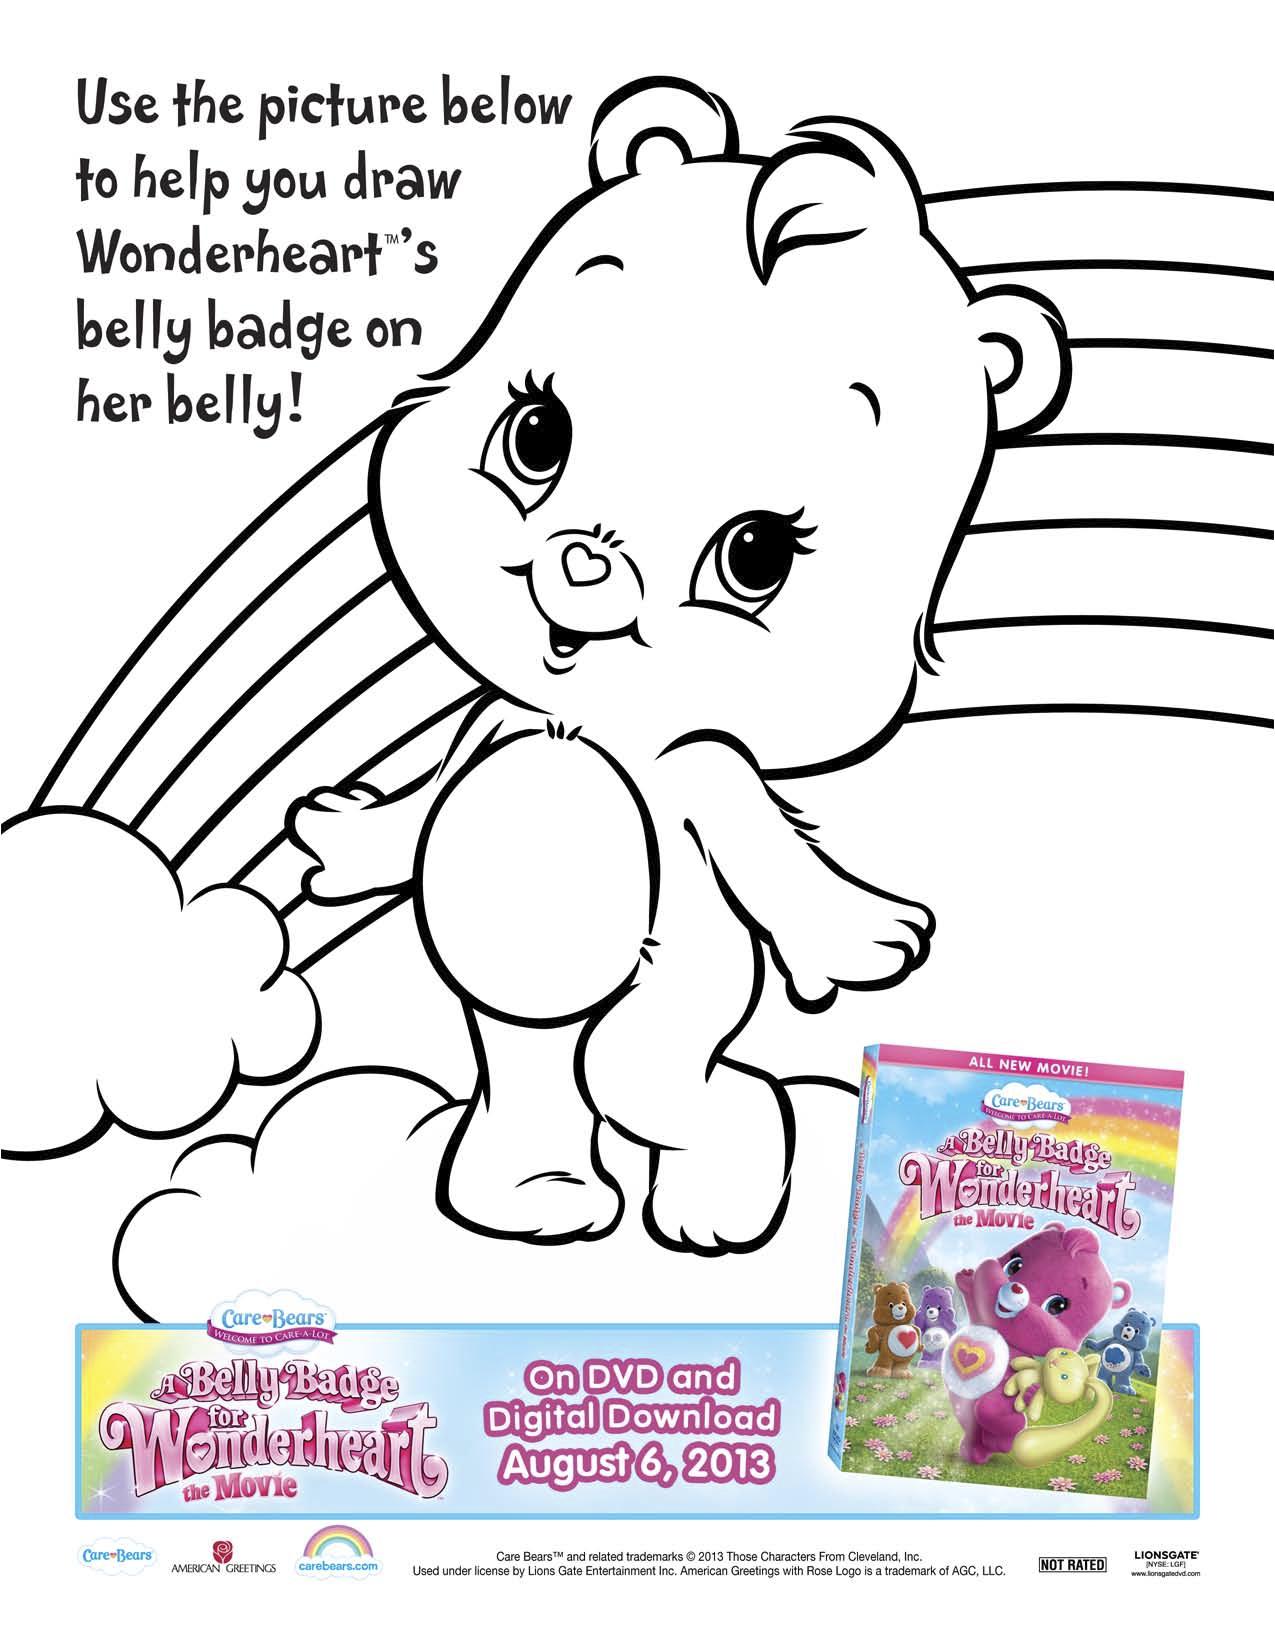 Care Bears A Belly Badge For Wonderheart Printable